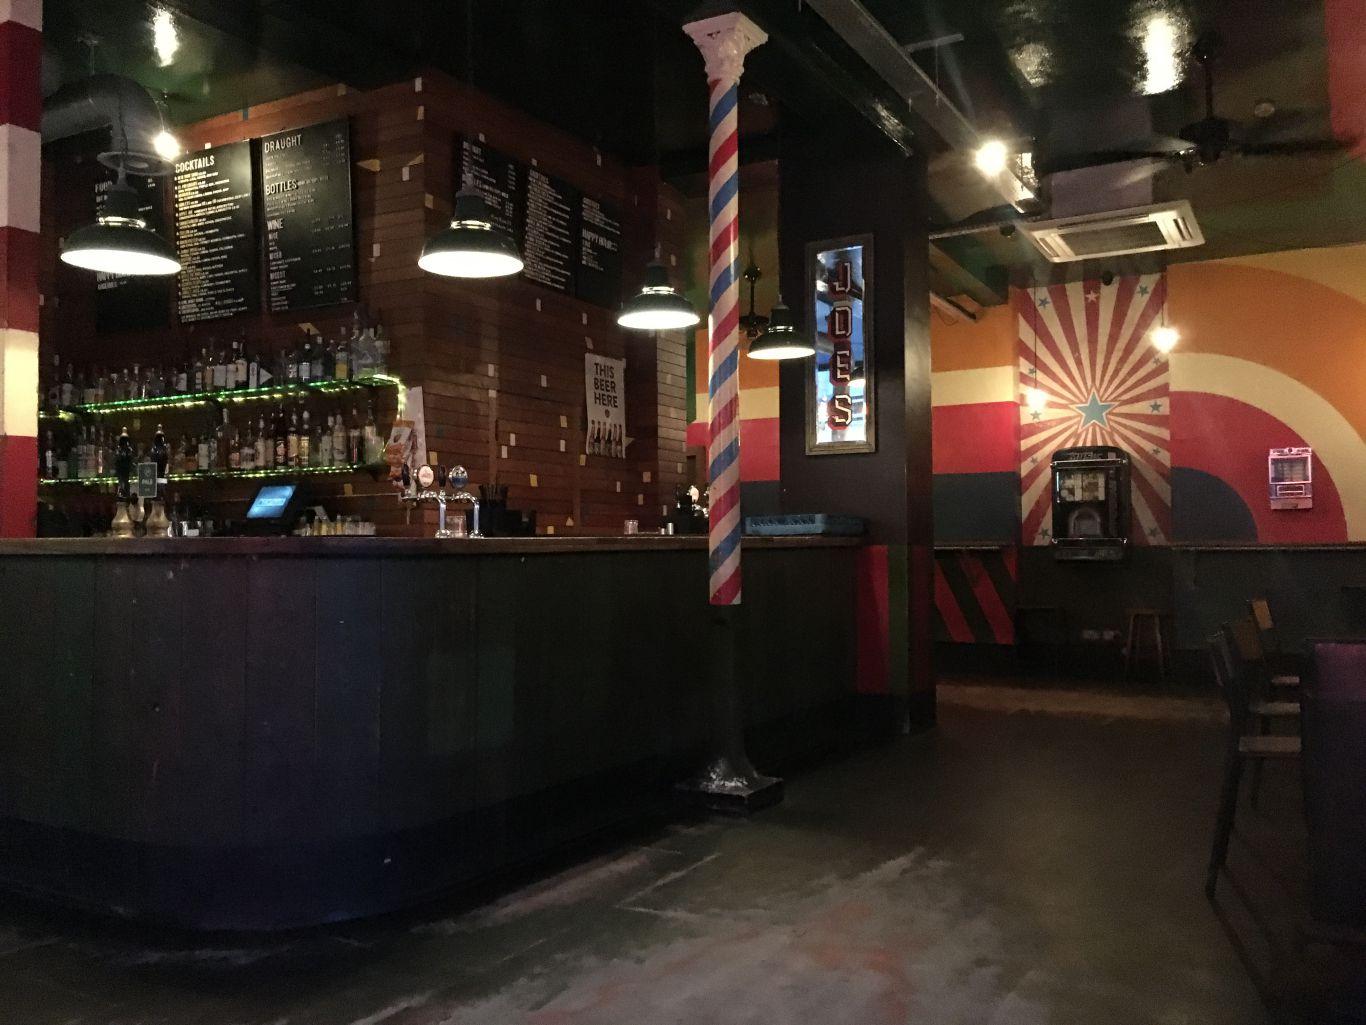 A useful late-night bar whatever the day of the week. Photo: Joe's